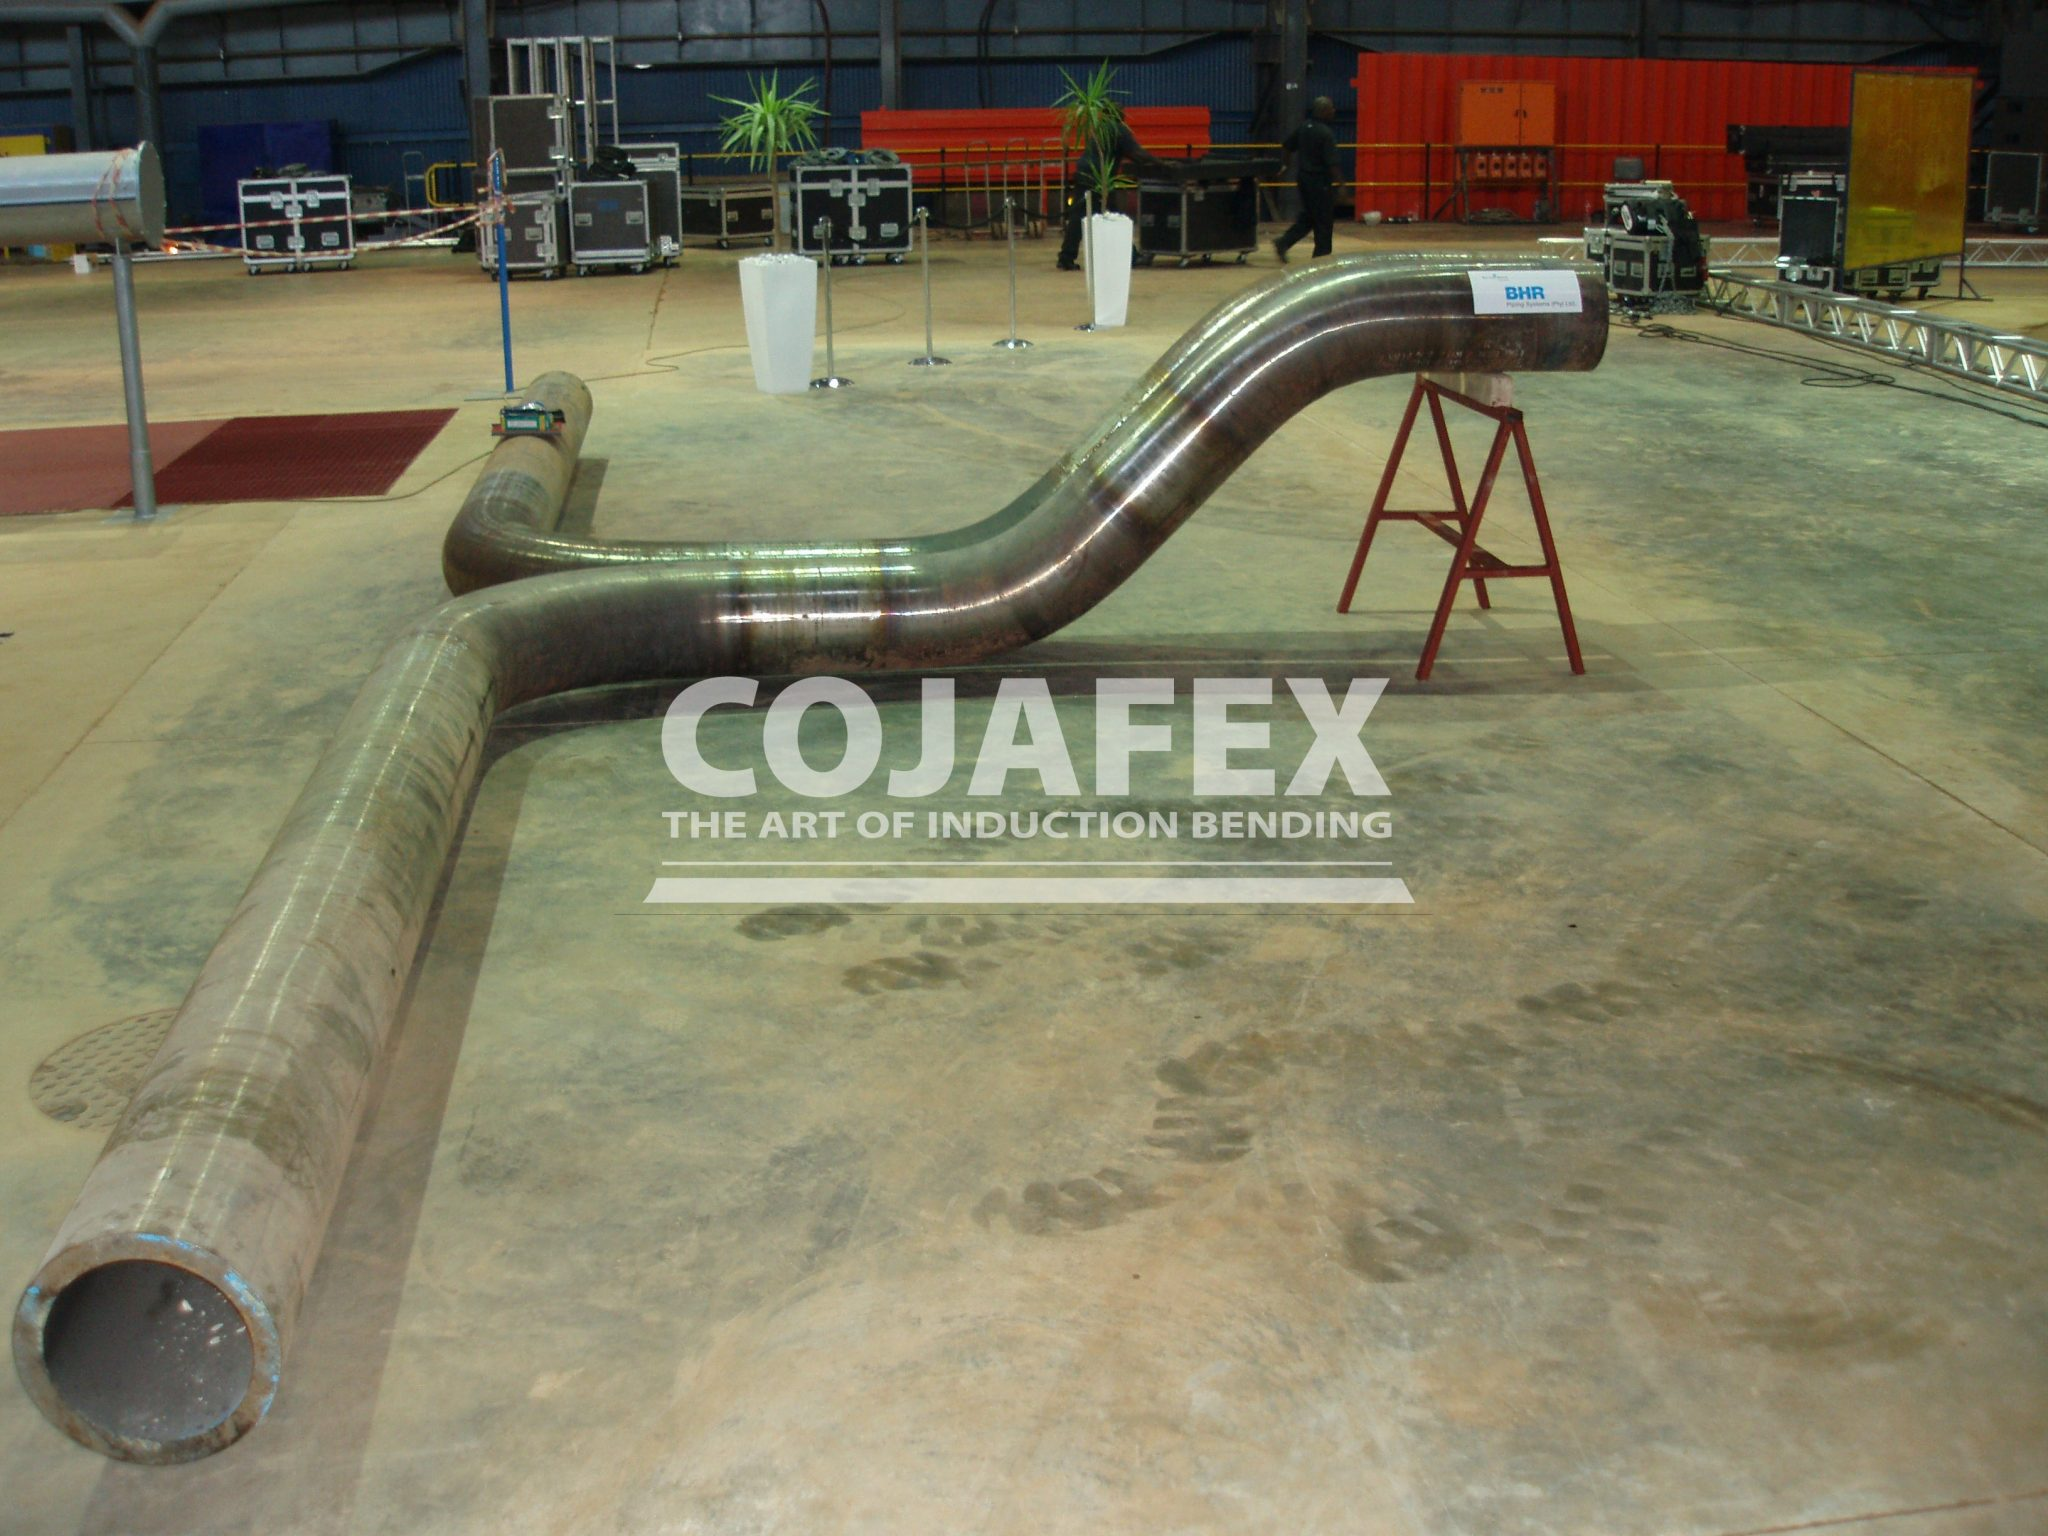 Cojafex Spool bending